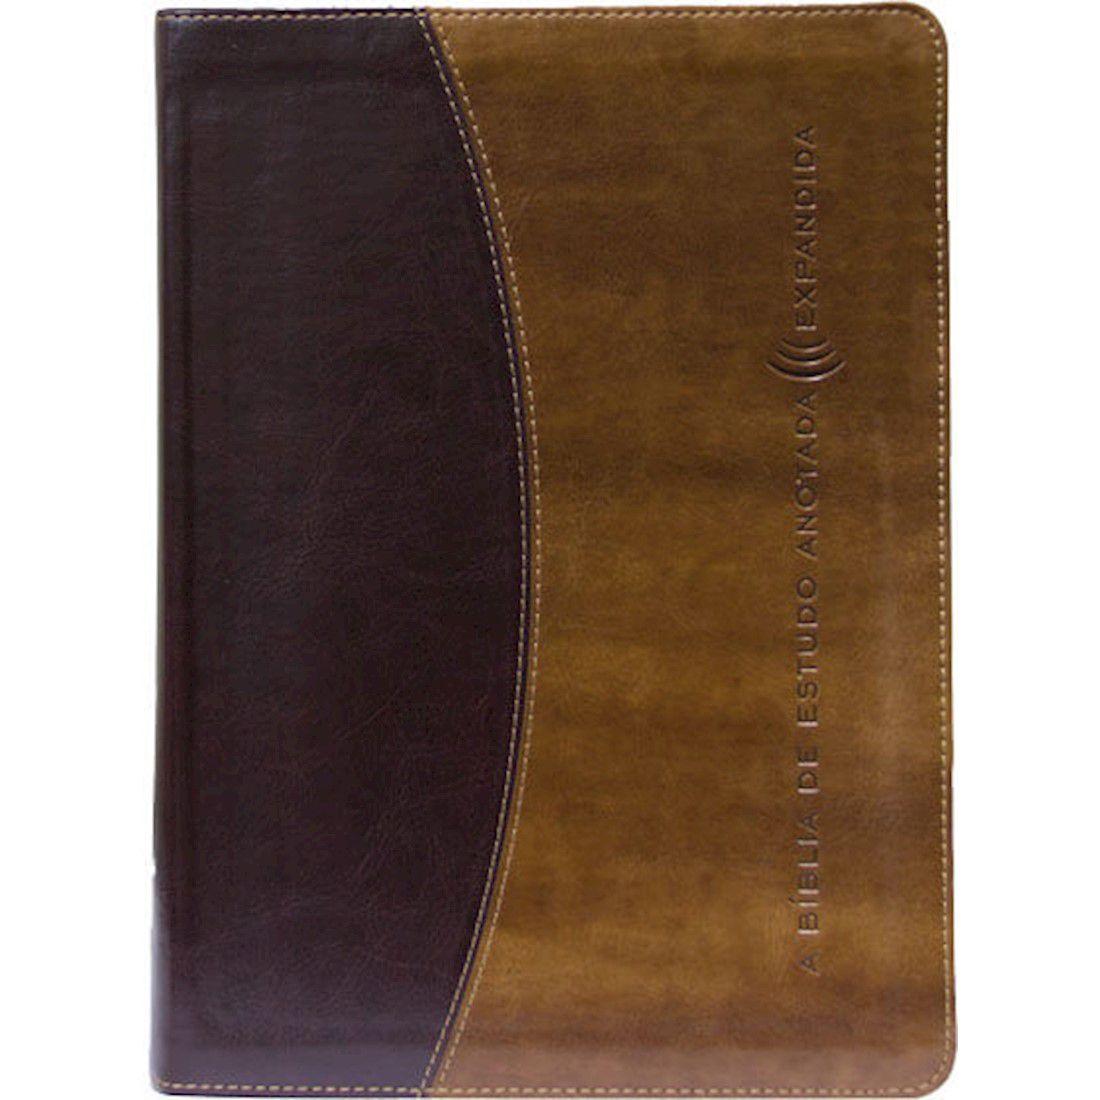 Bíblia Anotada Expandida